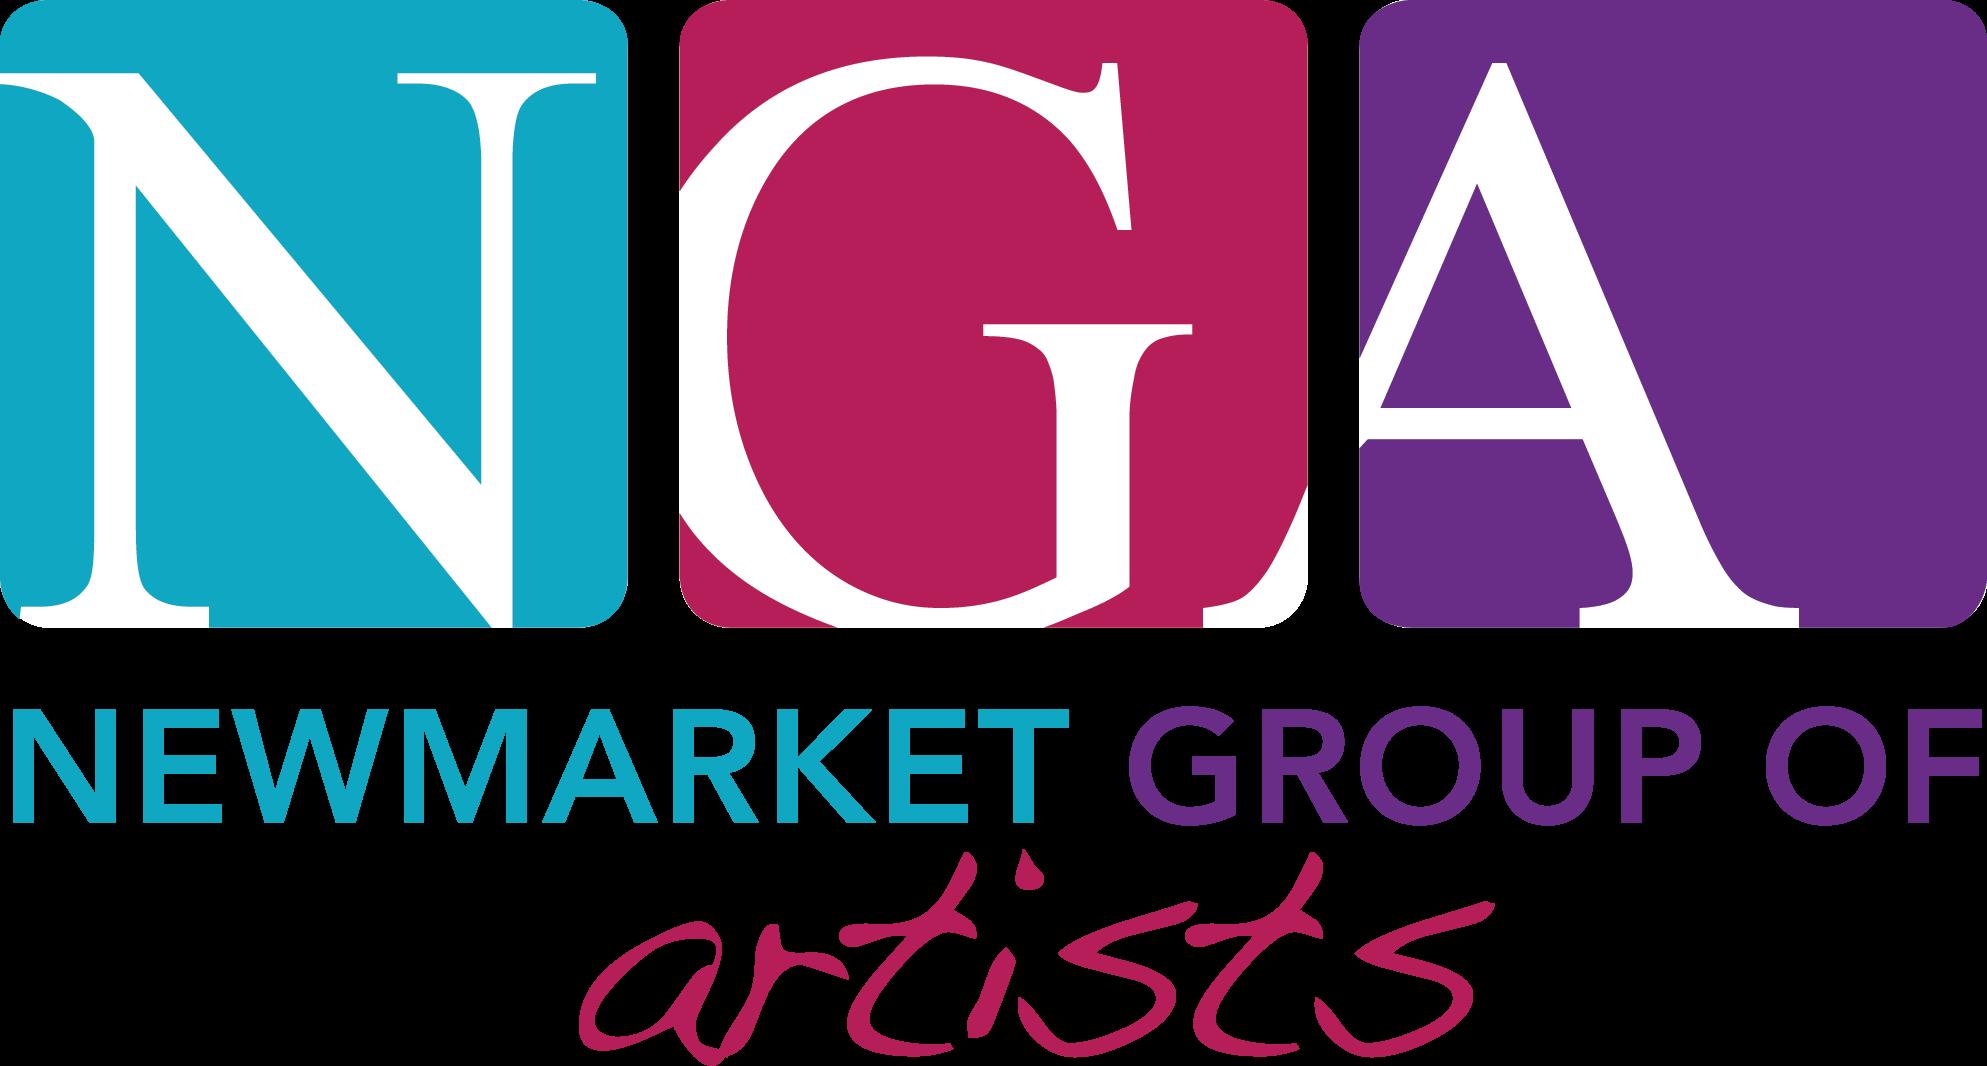 https://0901.nccdn.net/4_2/000/000/01e/20c/NGA_logo_black-1987x1066.png